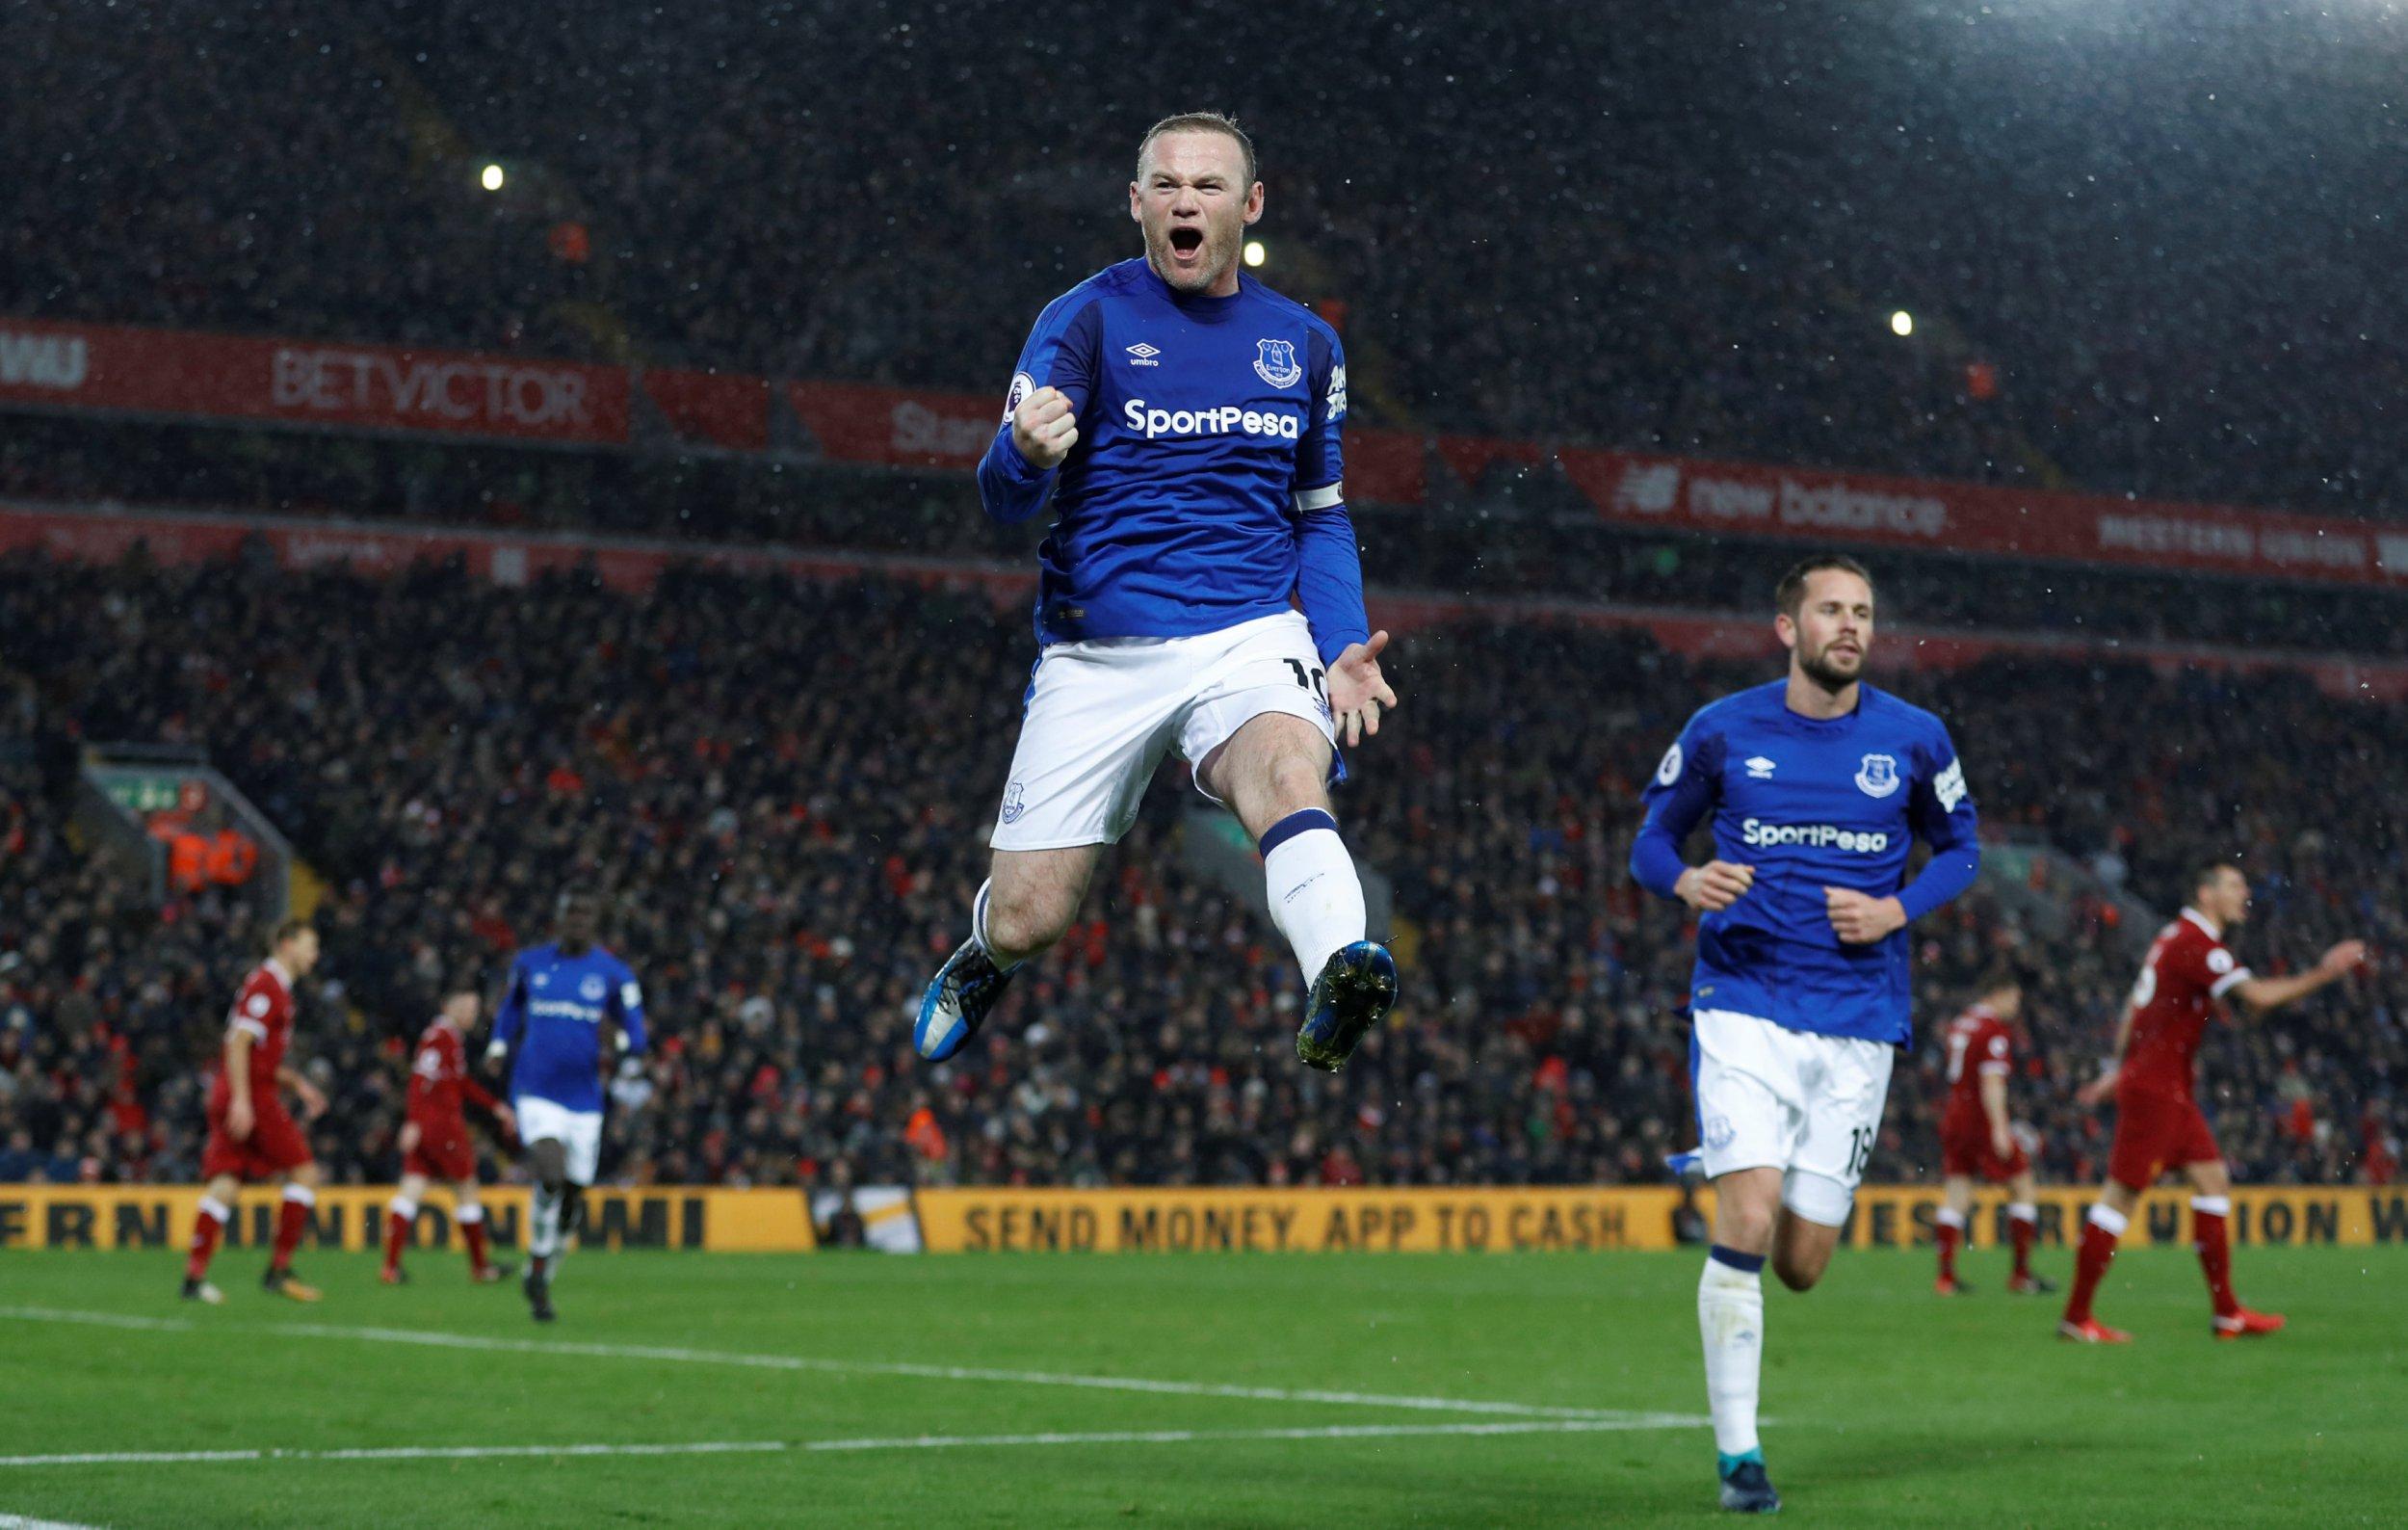 Wayne Rooney celebrates a goal at Anfield